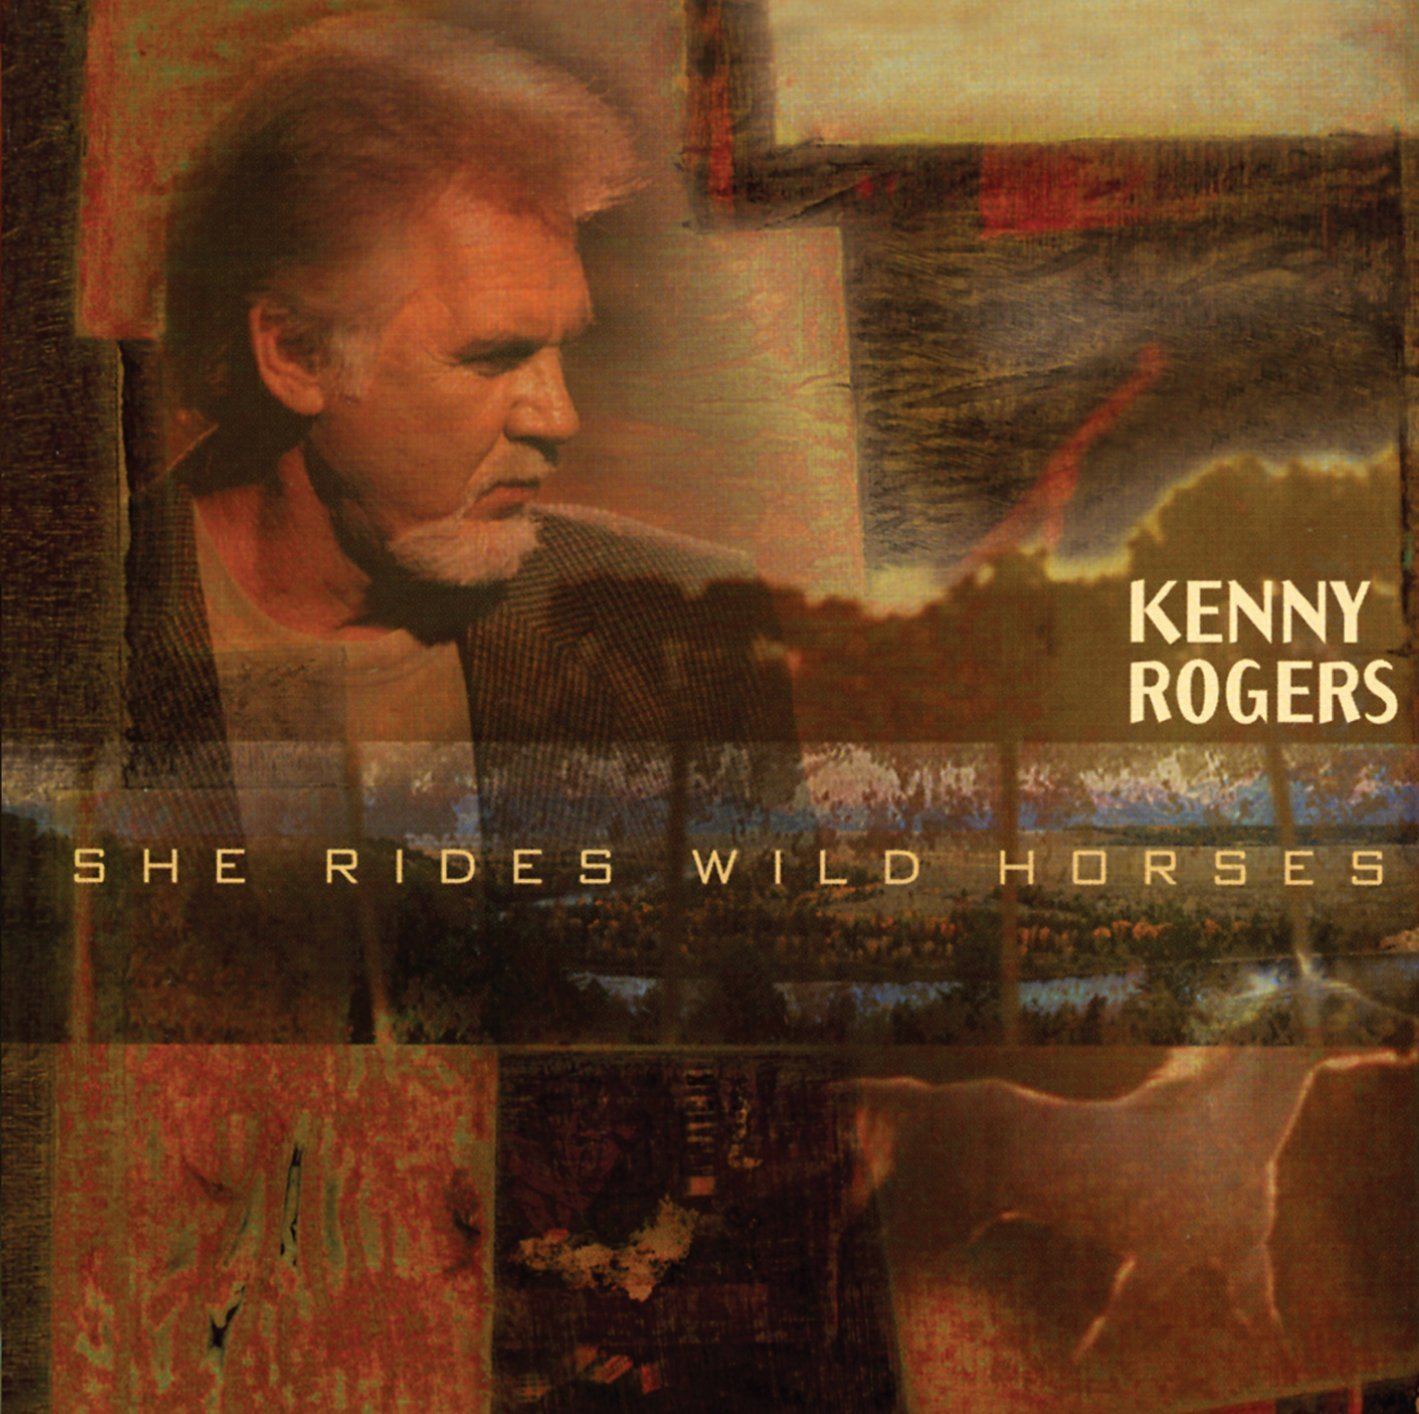 KENNY ROGERS - She Rides Wild Horses - Amazon.com Music